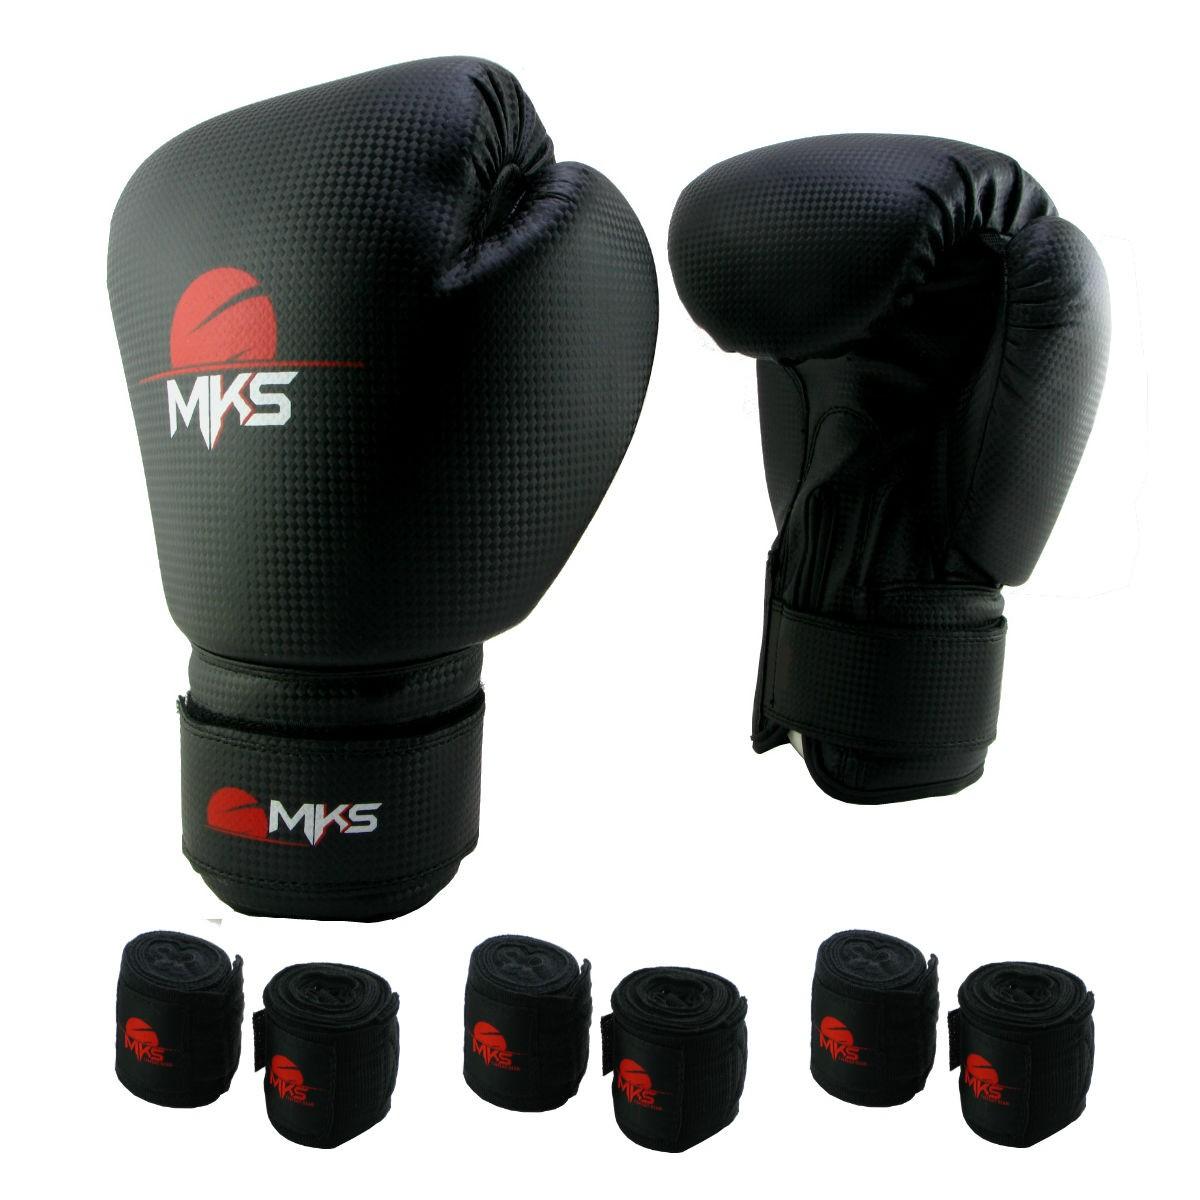 Luva de Boxe Prospect MKS Preta 14 oz +  03 bandagem